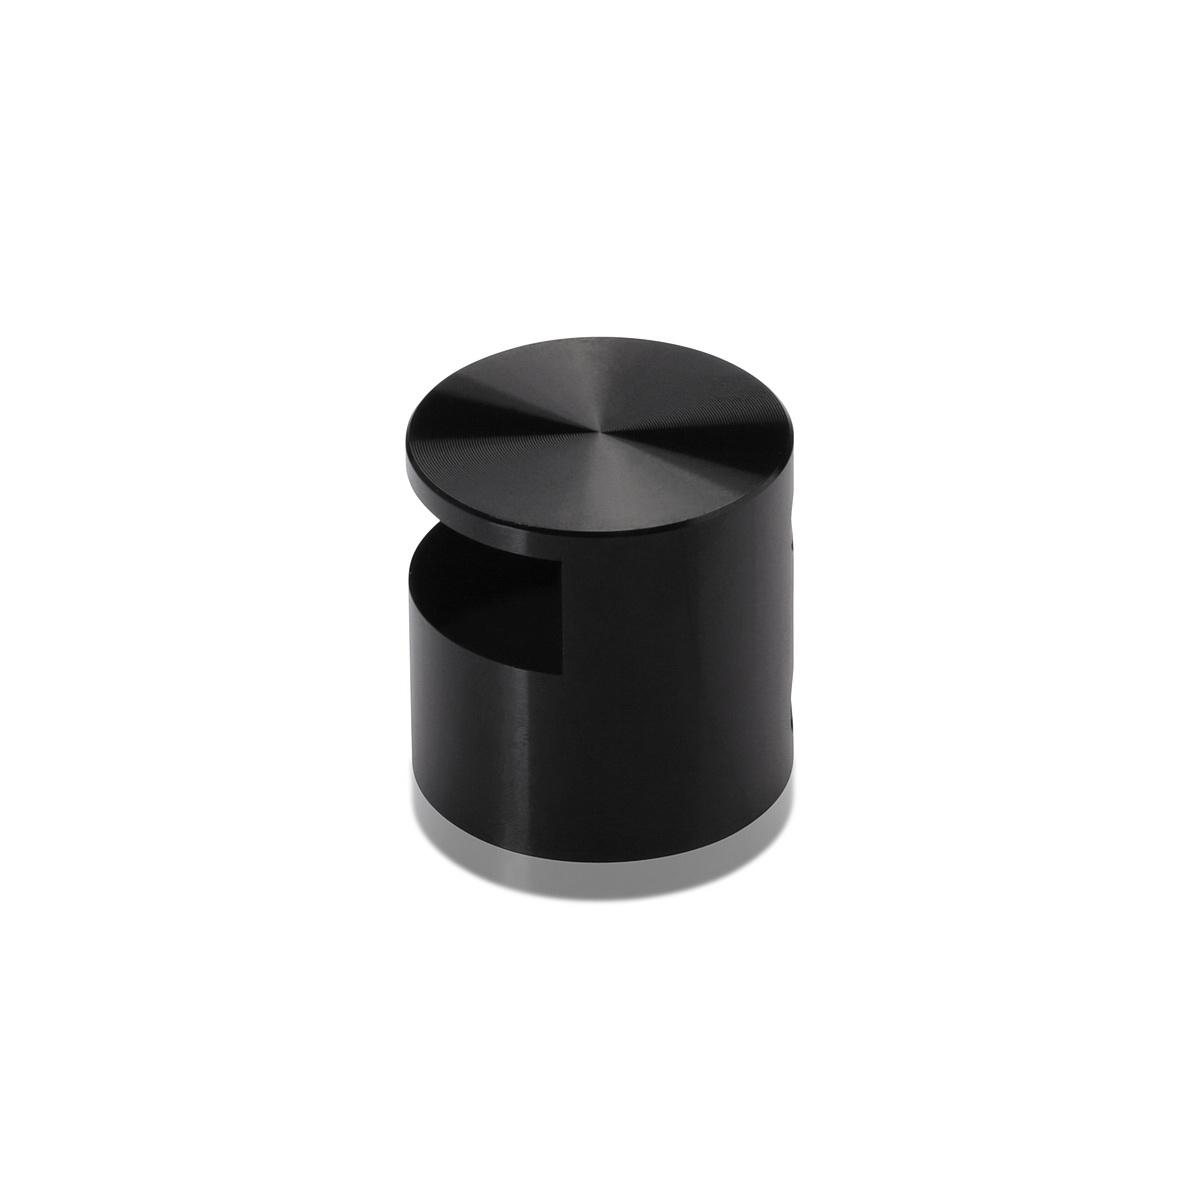 Aluminum Edge Grip, Diameter 1'', Standoff 9/16'' Black Anodize Shiny Finish